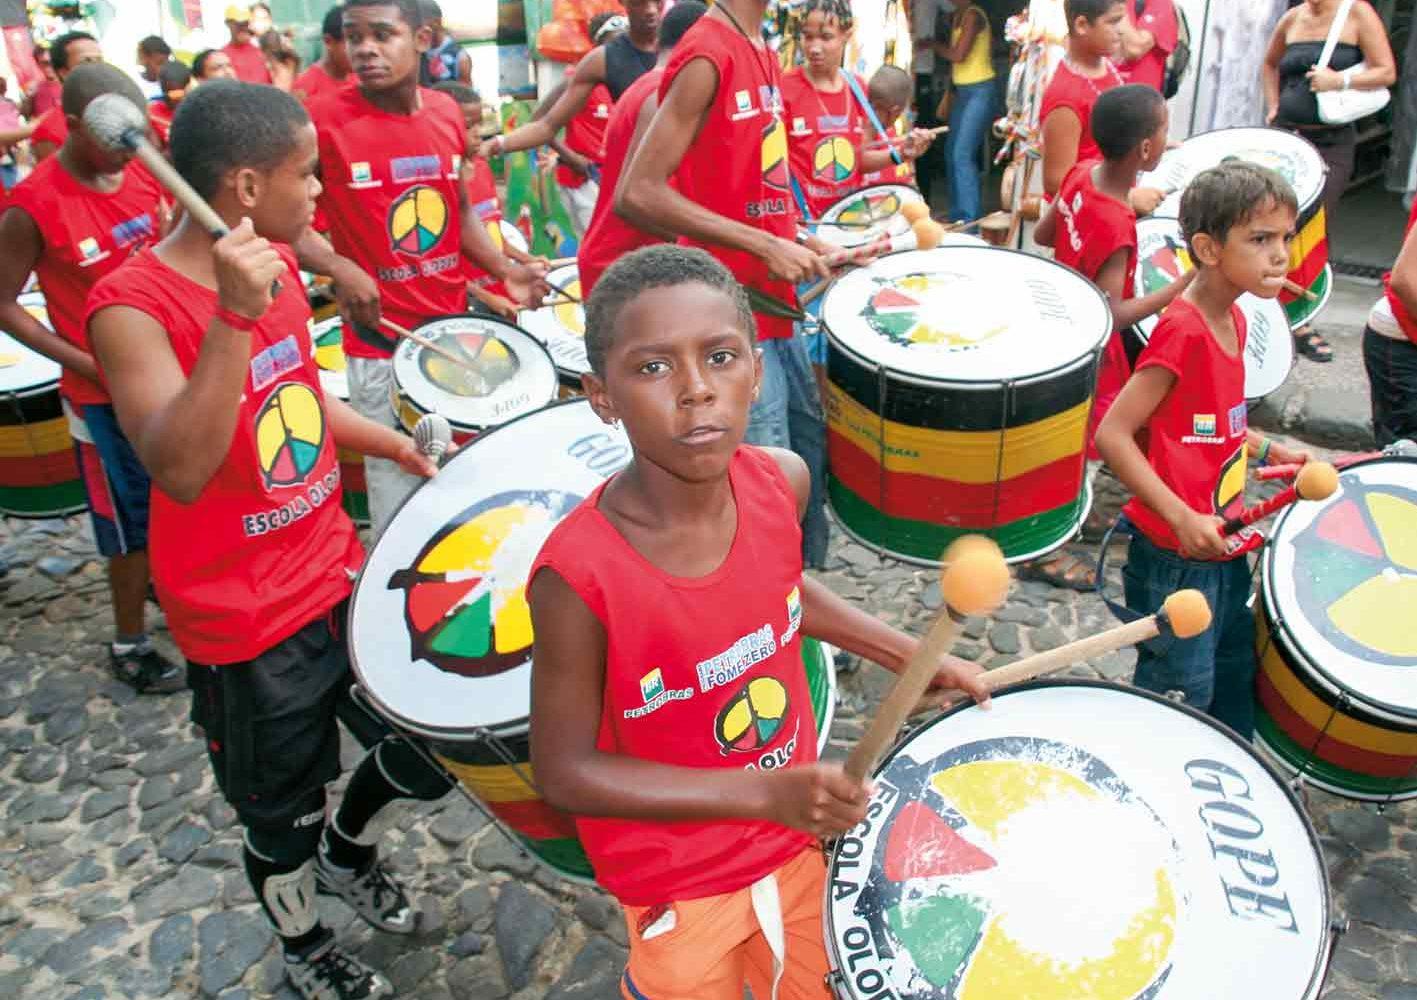 Carneval in Salvador